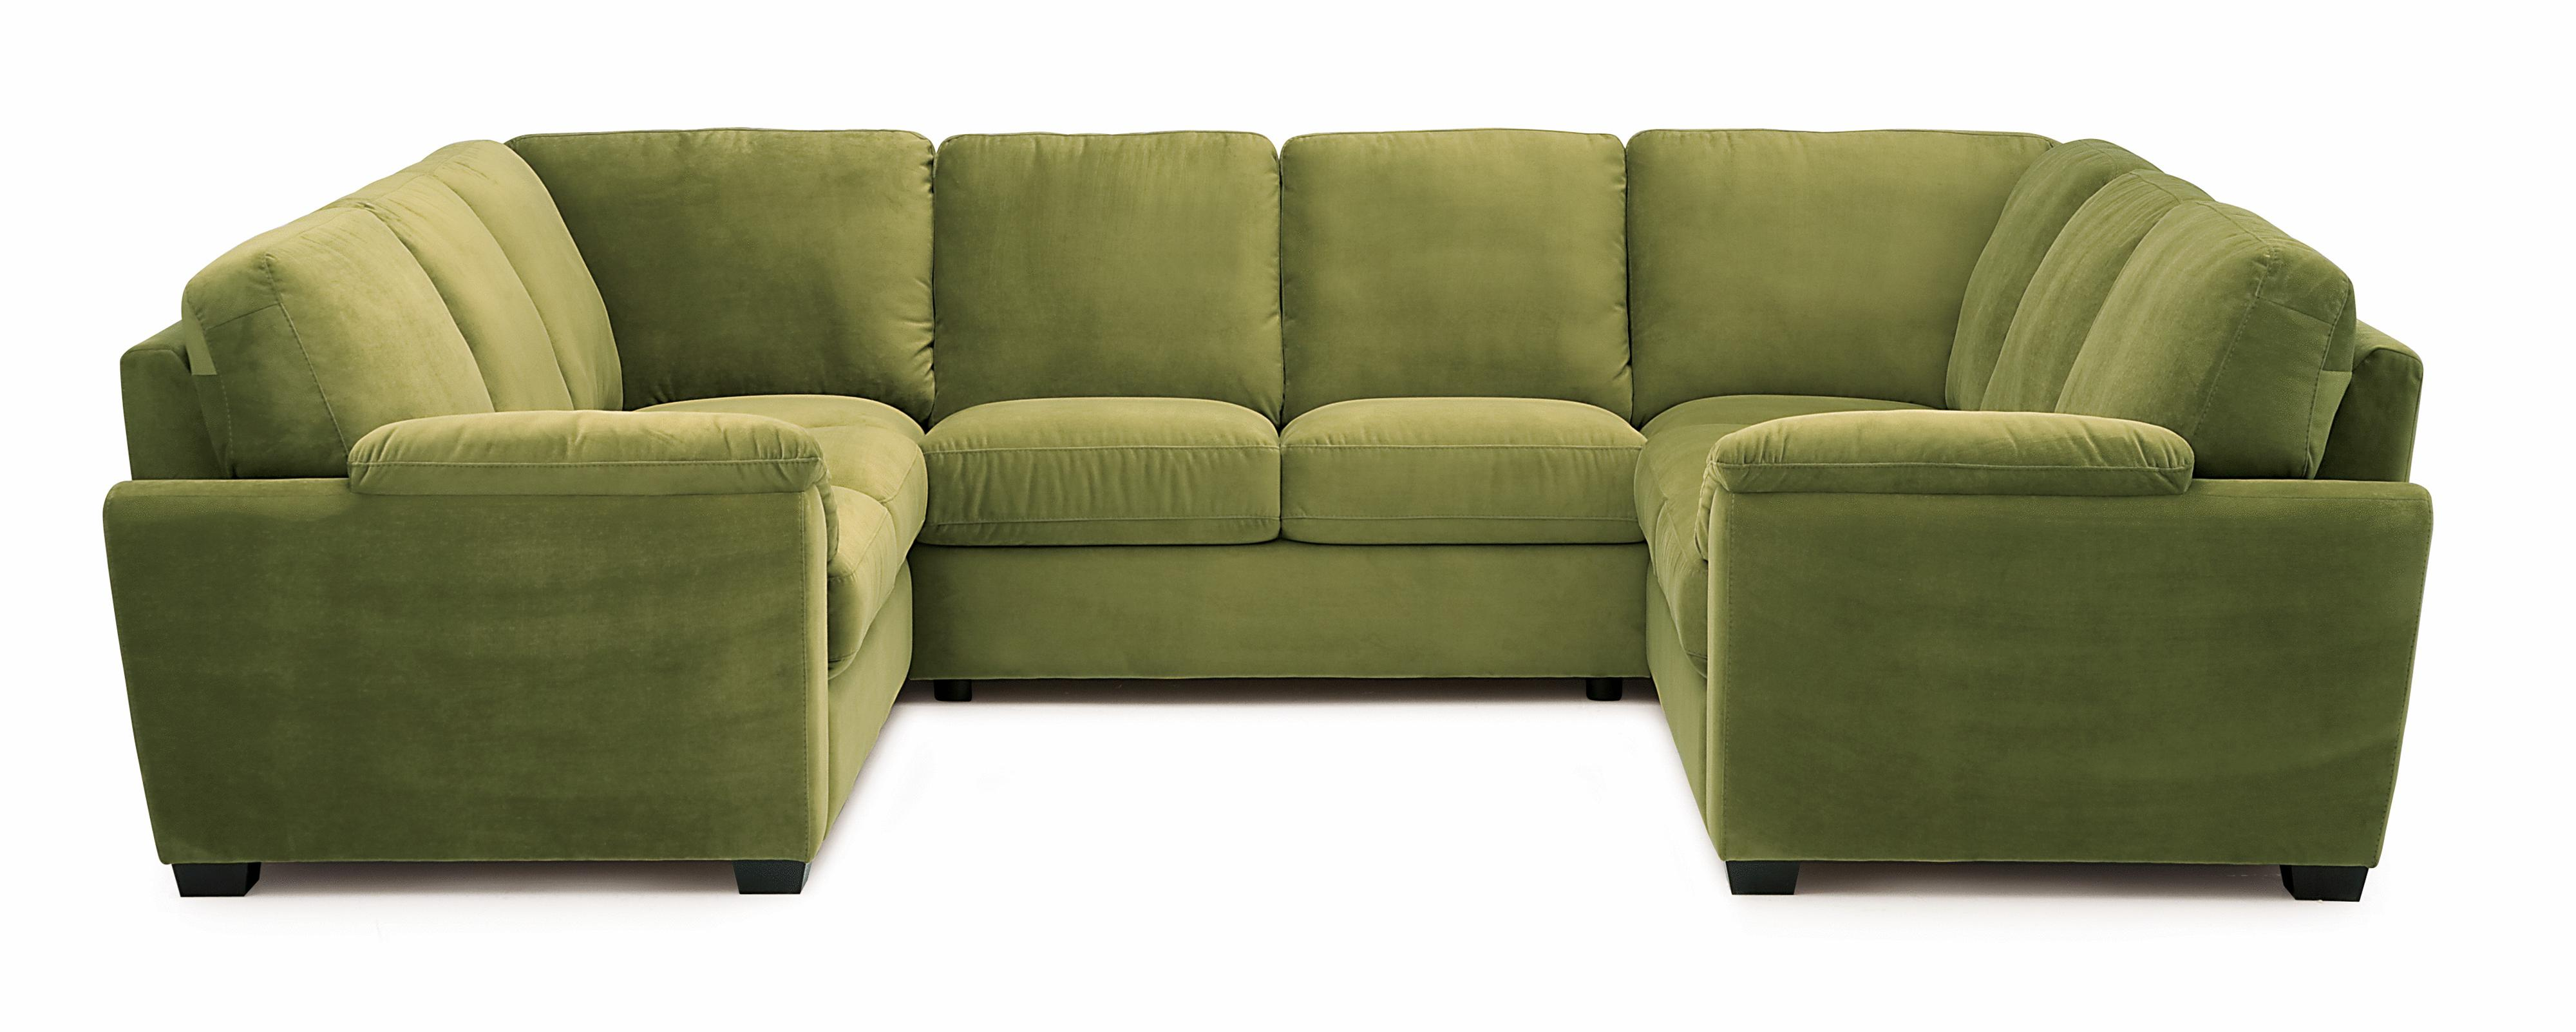 casual square sectional sofa olinde 39 s furniture sofa sectional